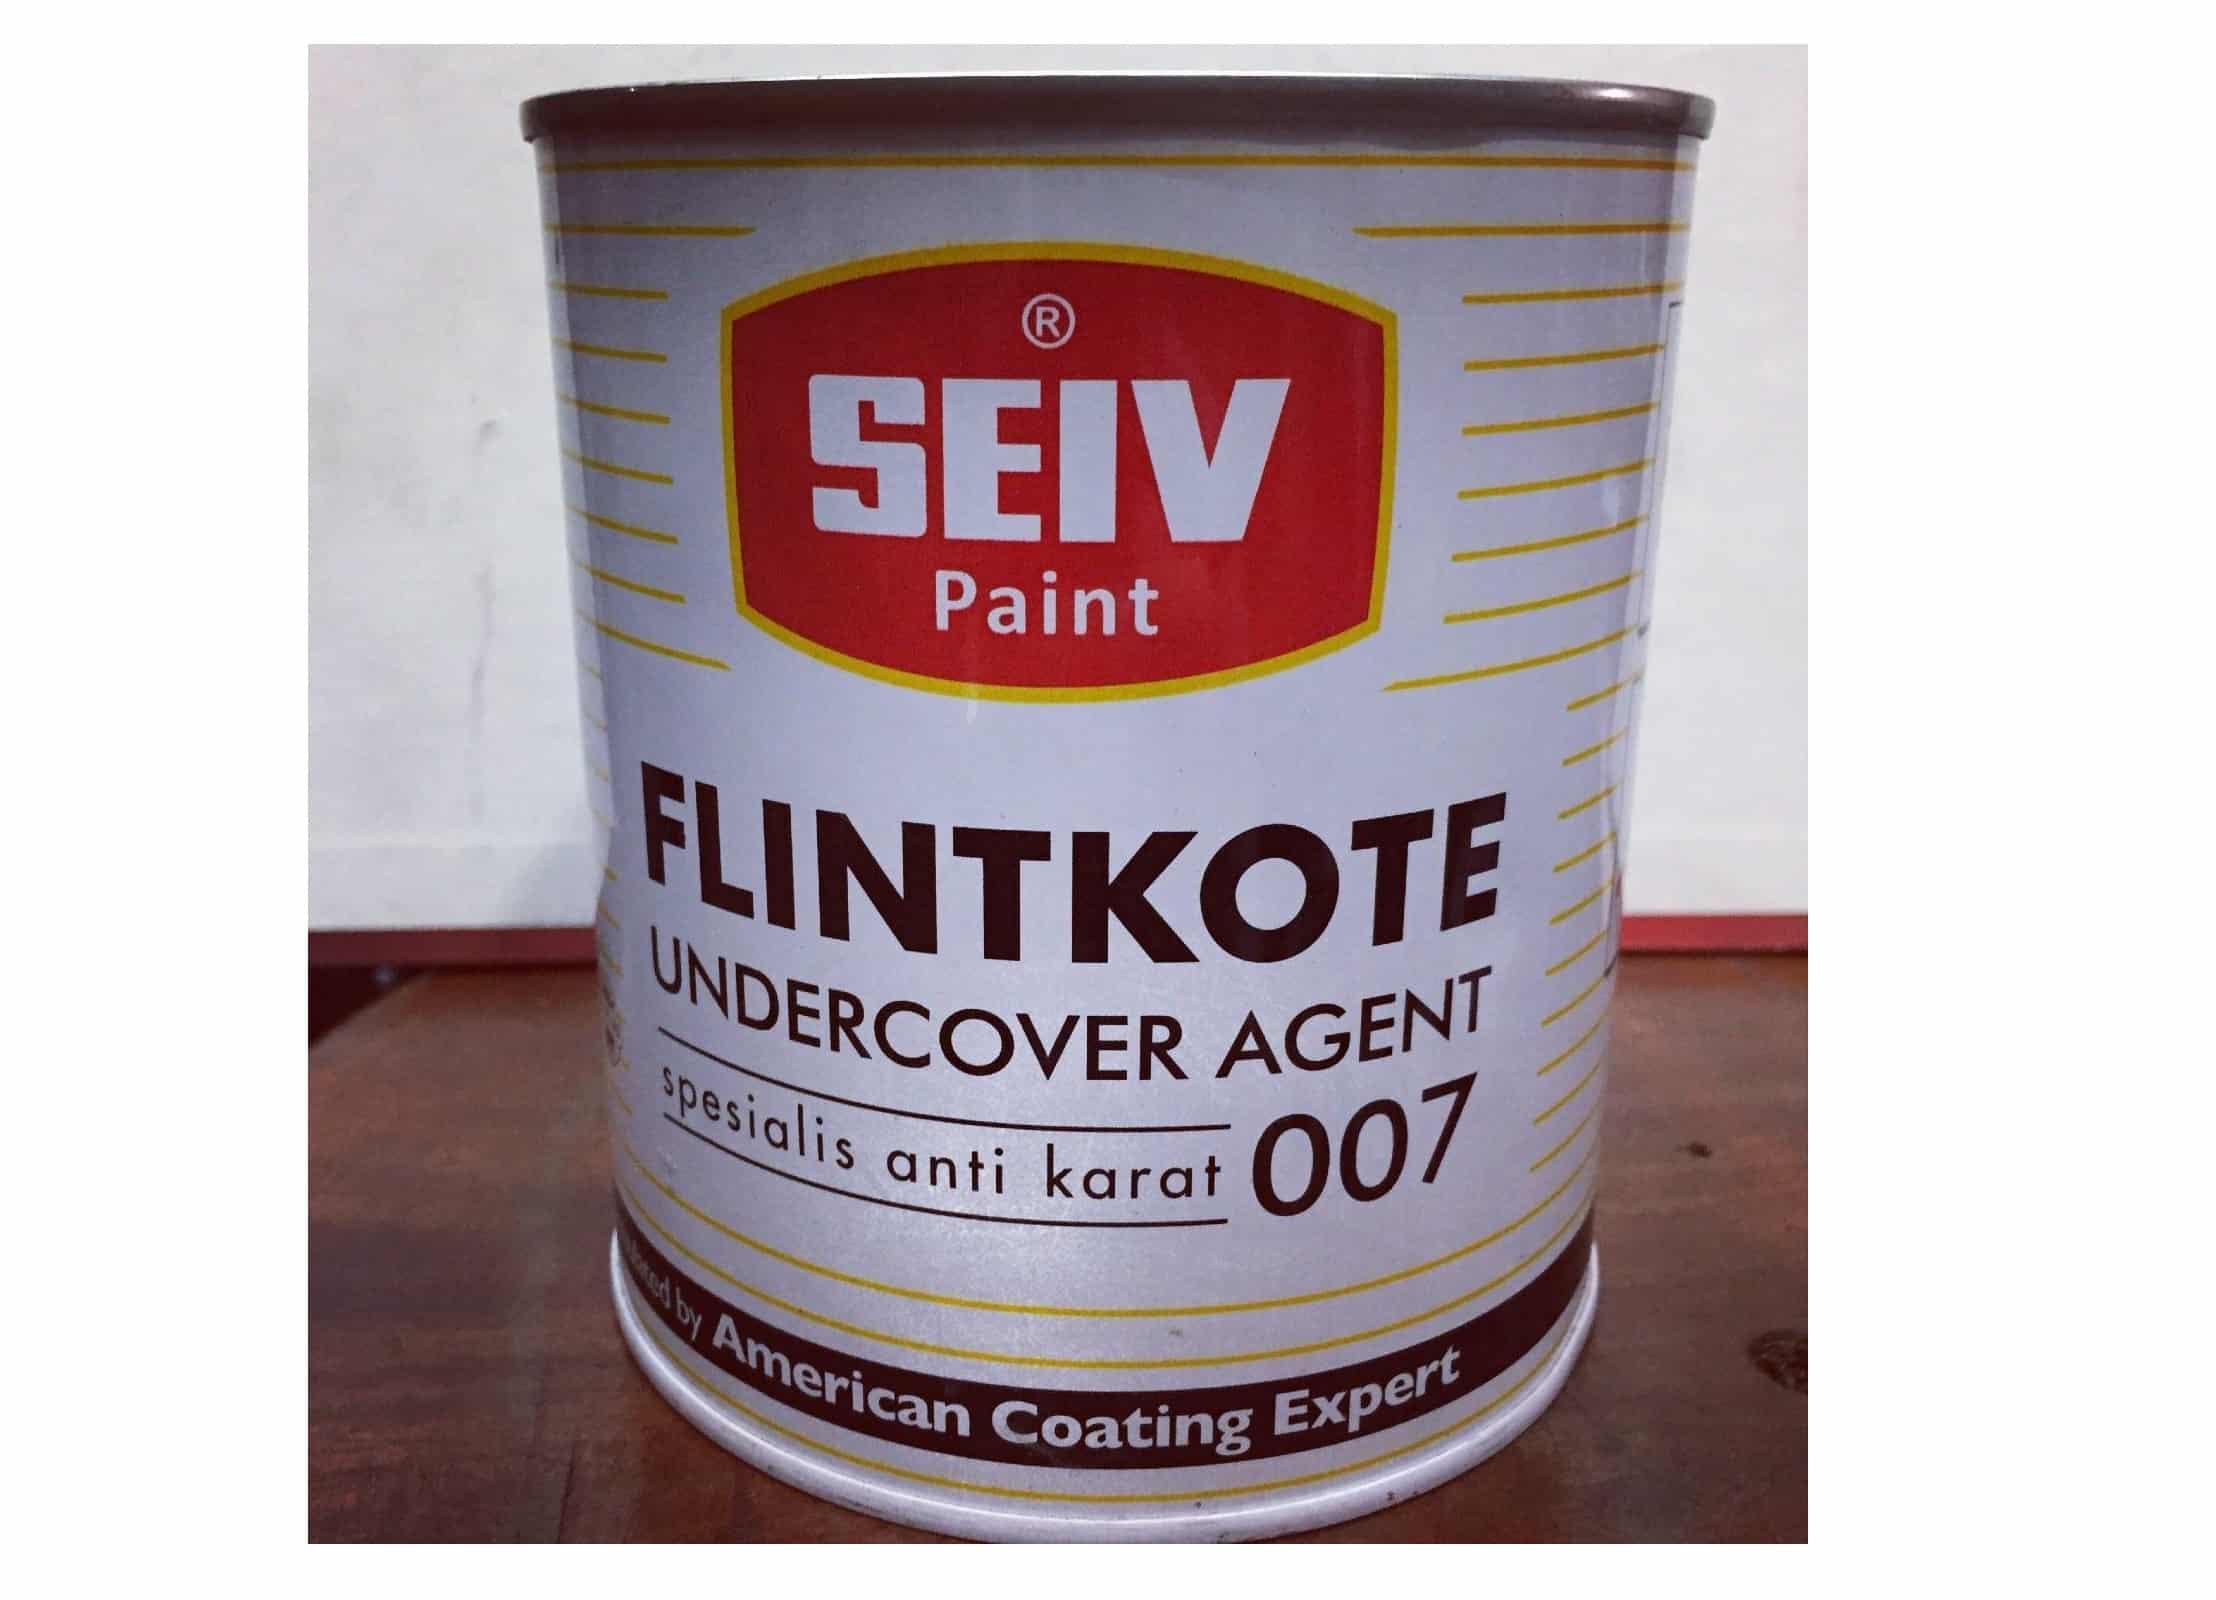 Seiv-Paint-Varian-Flikote-Undercover-Anti-Karat-007